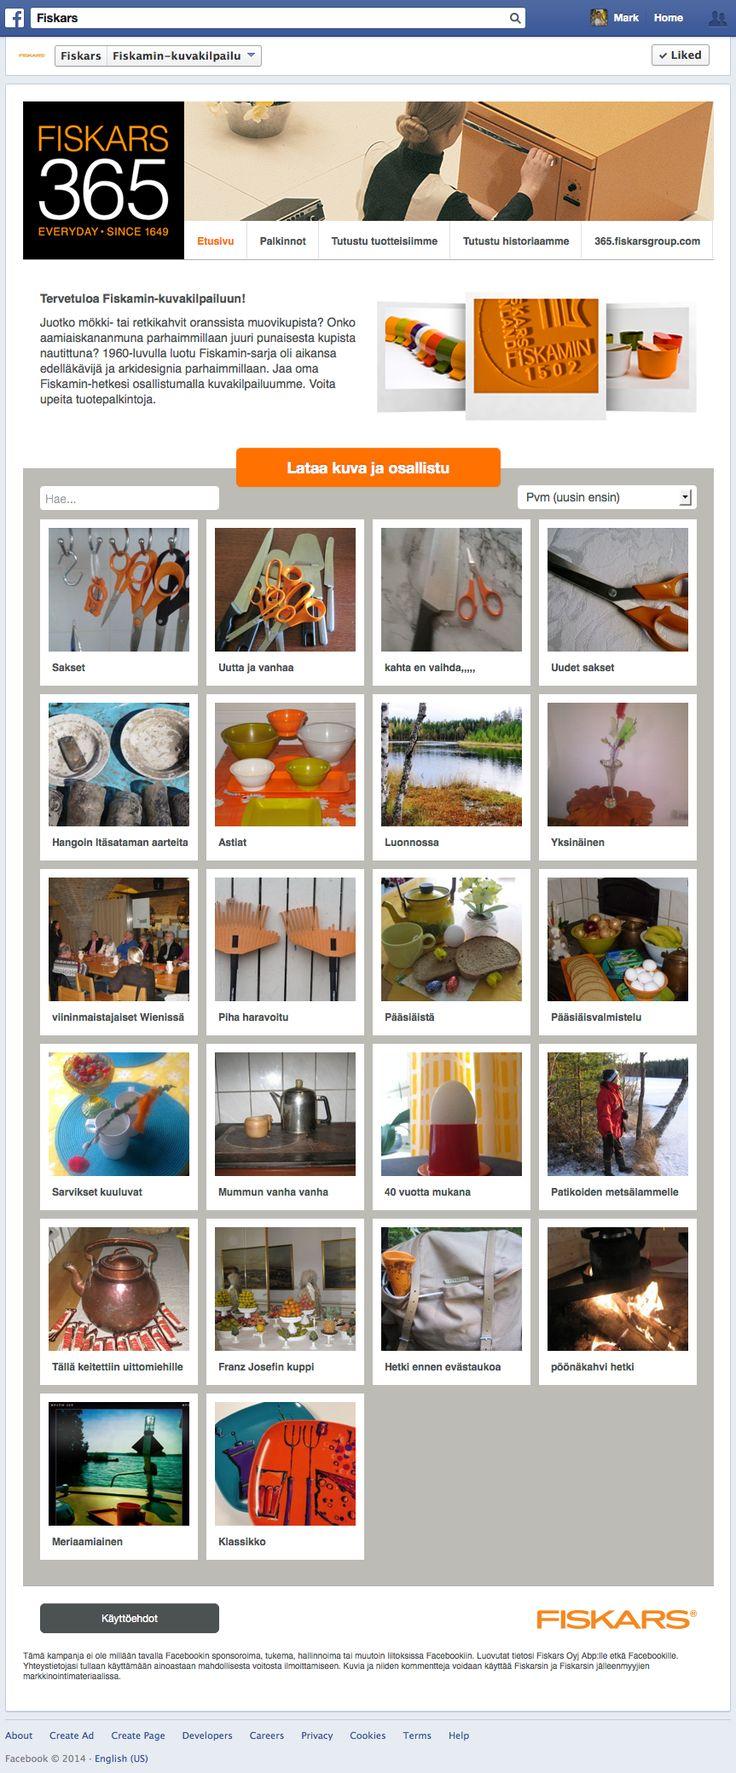 Photo Competition for Fiskars Group based on the Fanbooster platform.